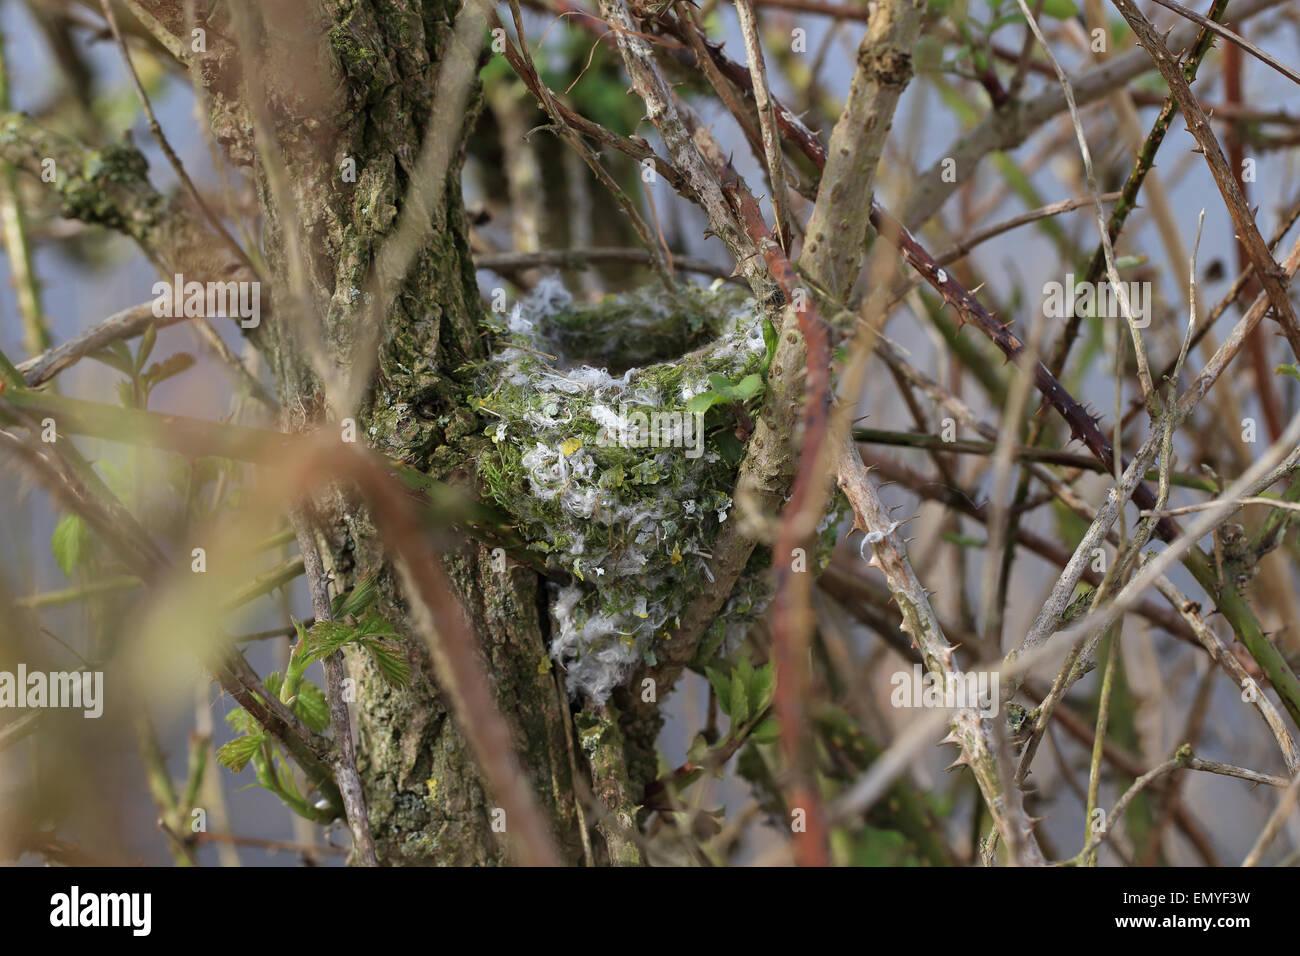 Chaffinch (Fringilla coelebs) nest Stock Photo